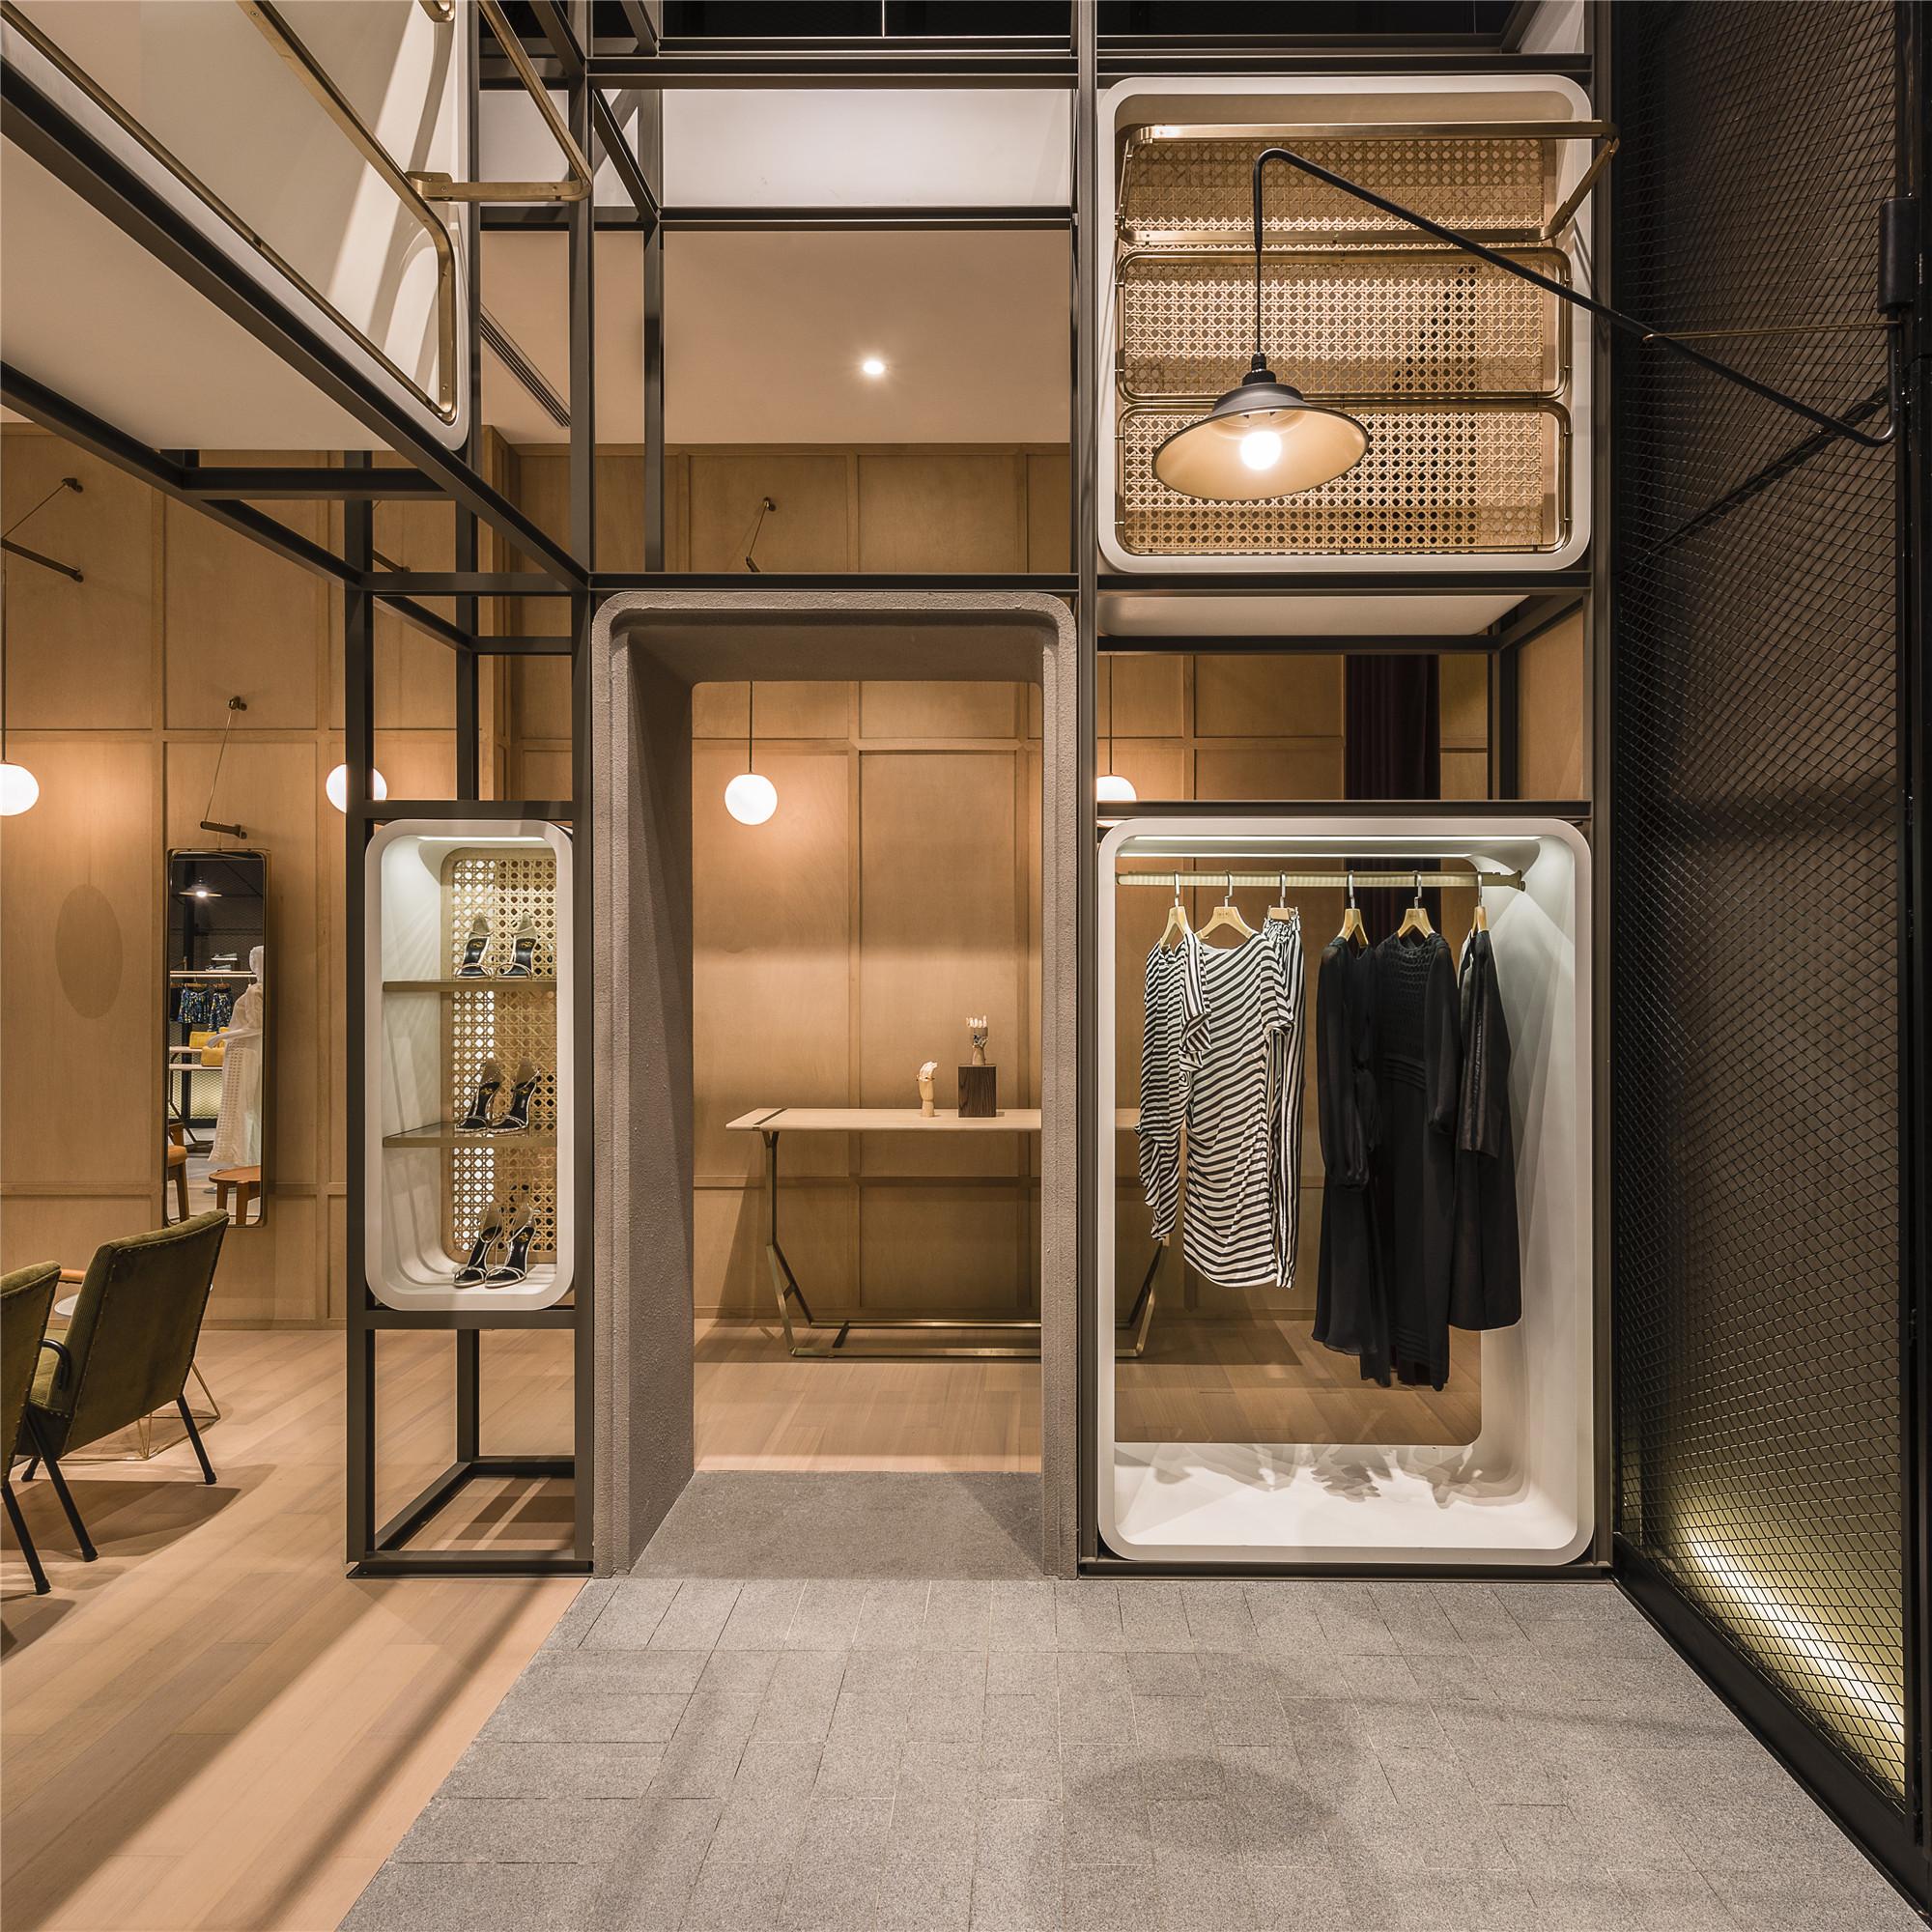 Gallery of the modular lilong lukstudio 4 for Retail interior design